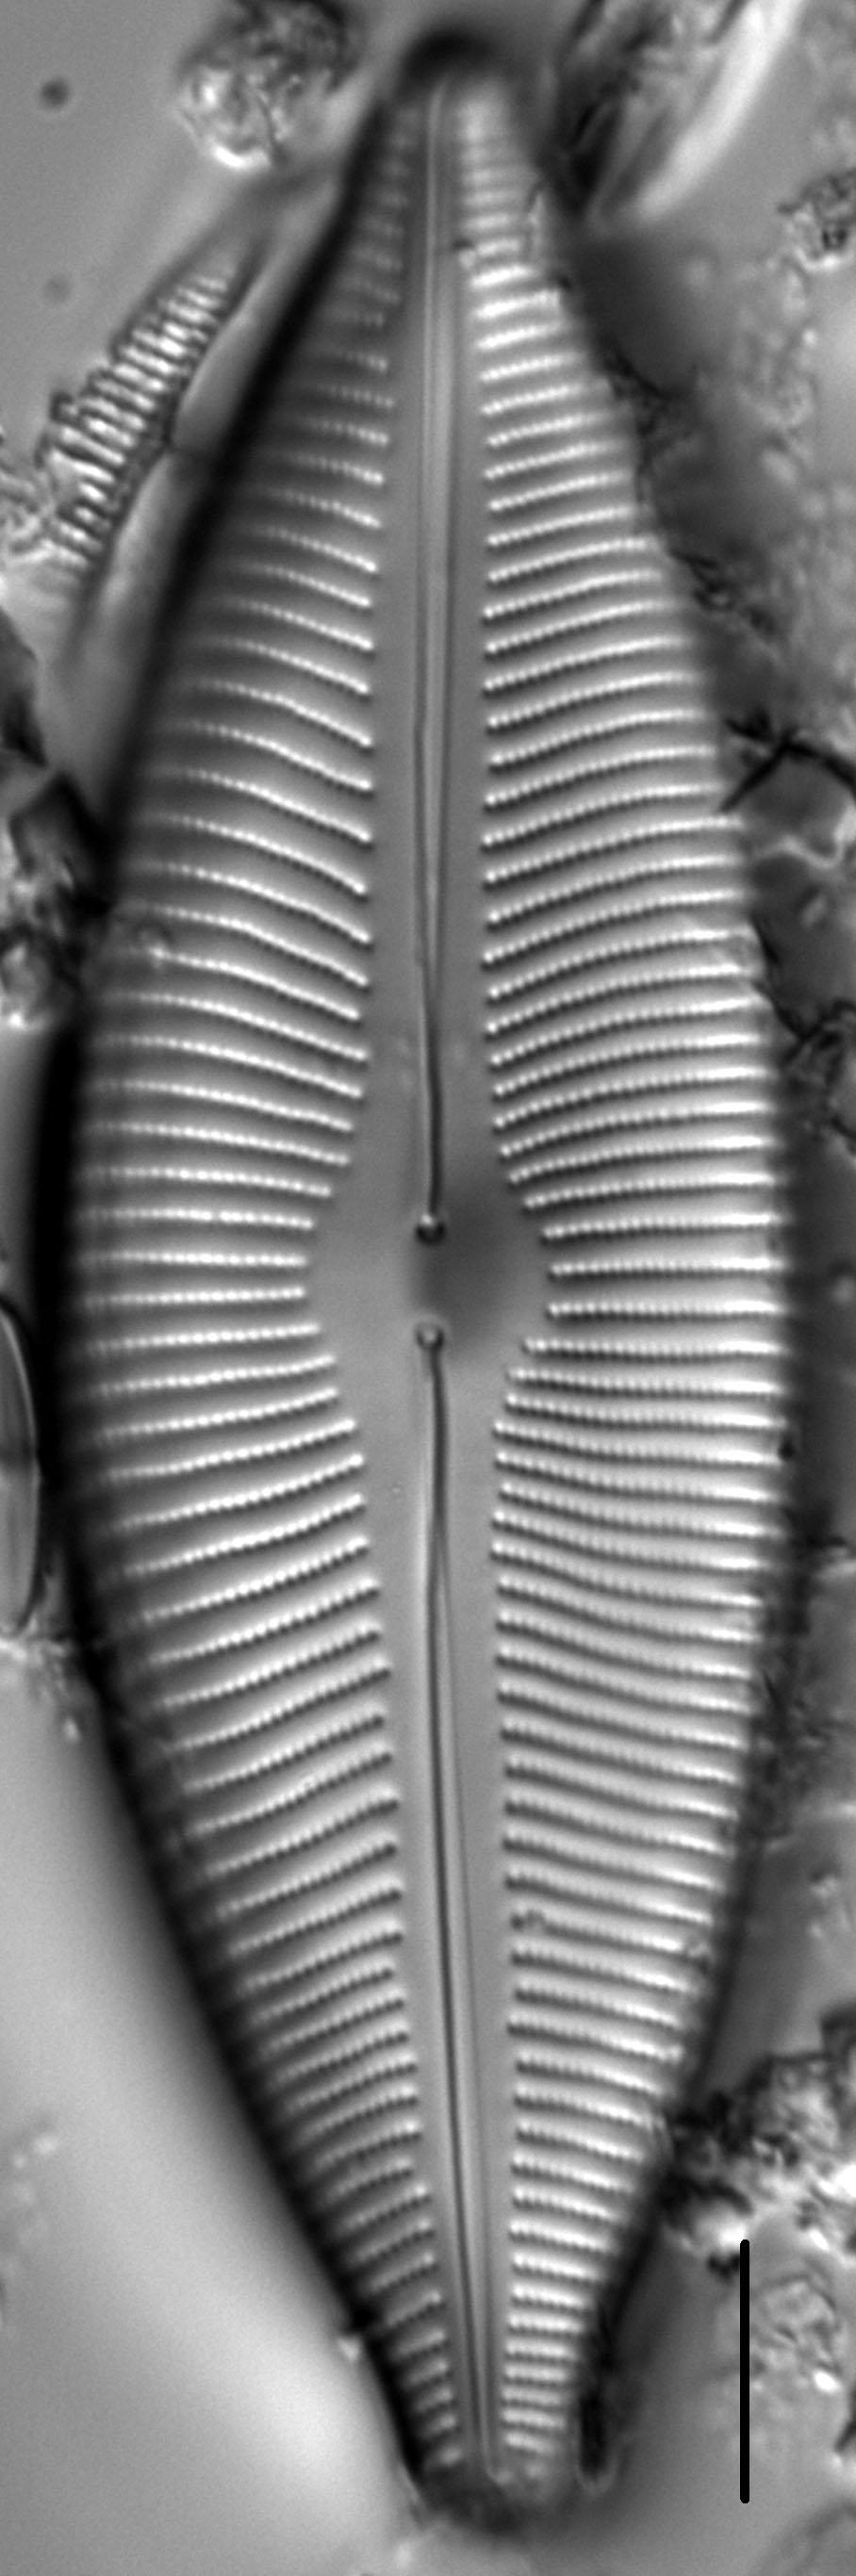 Cymboinaequalis5 1